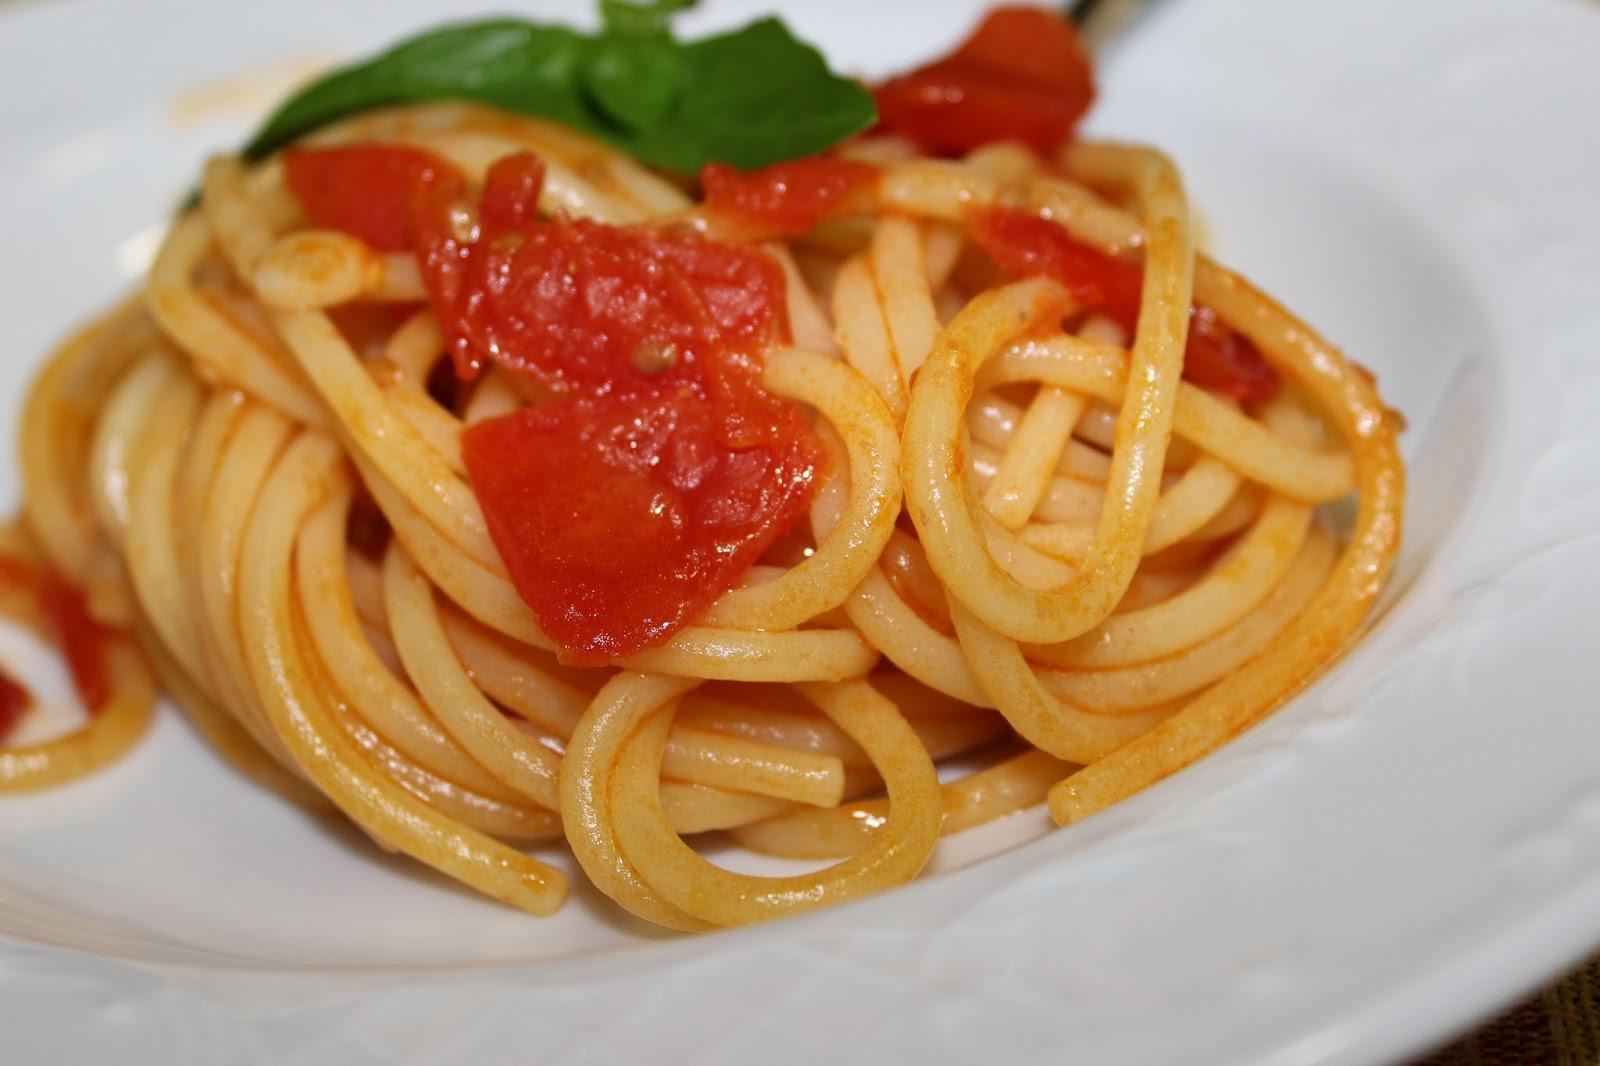 Grazie a Renzi la frode alimentare sara più semplice